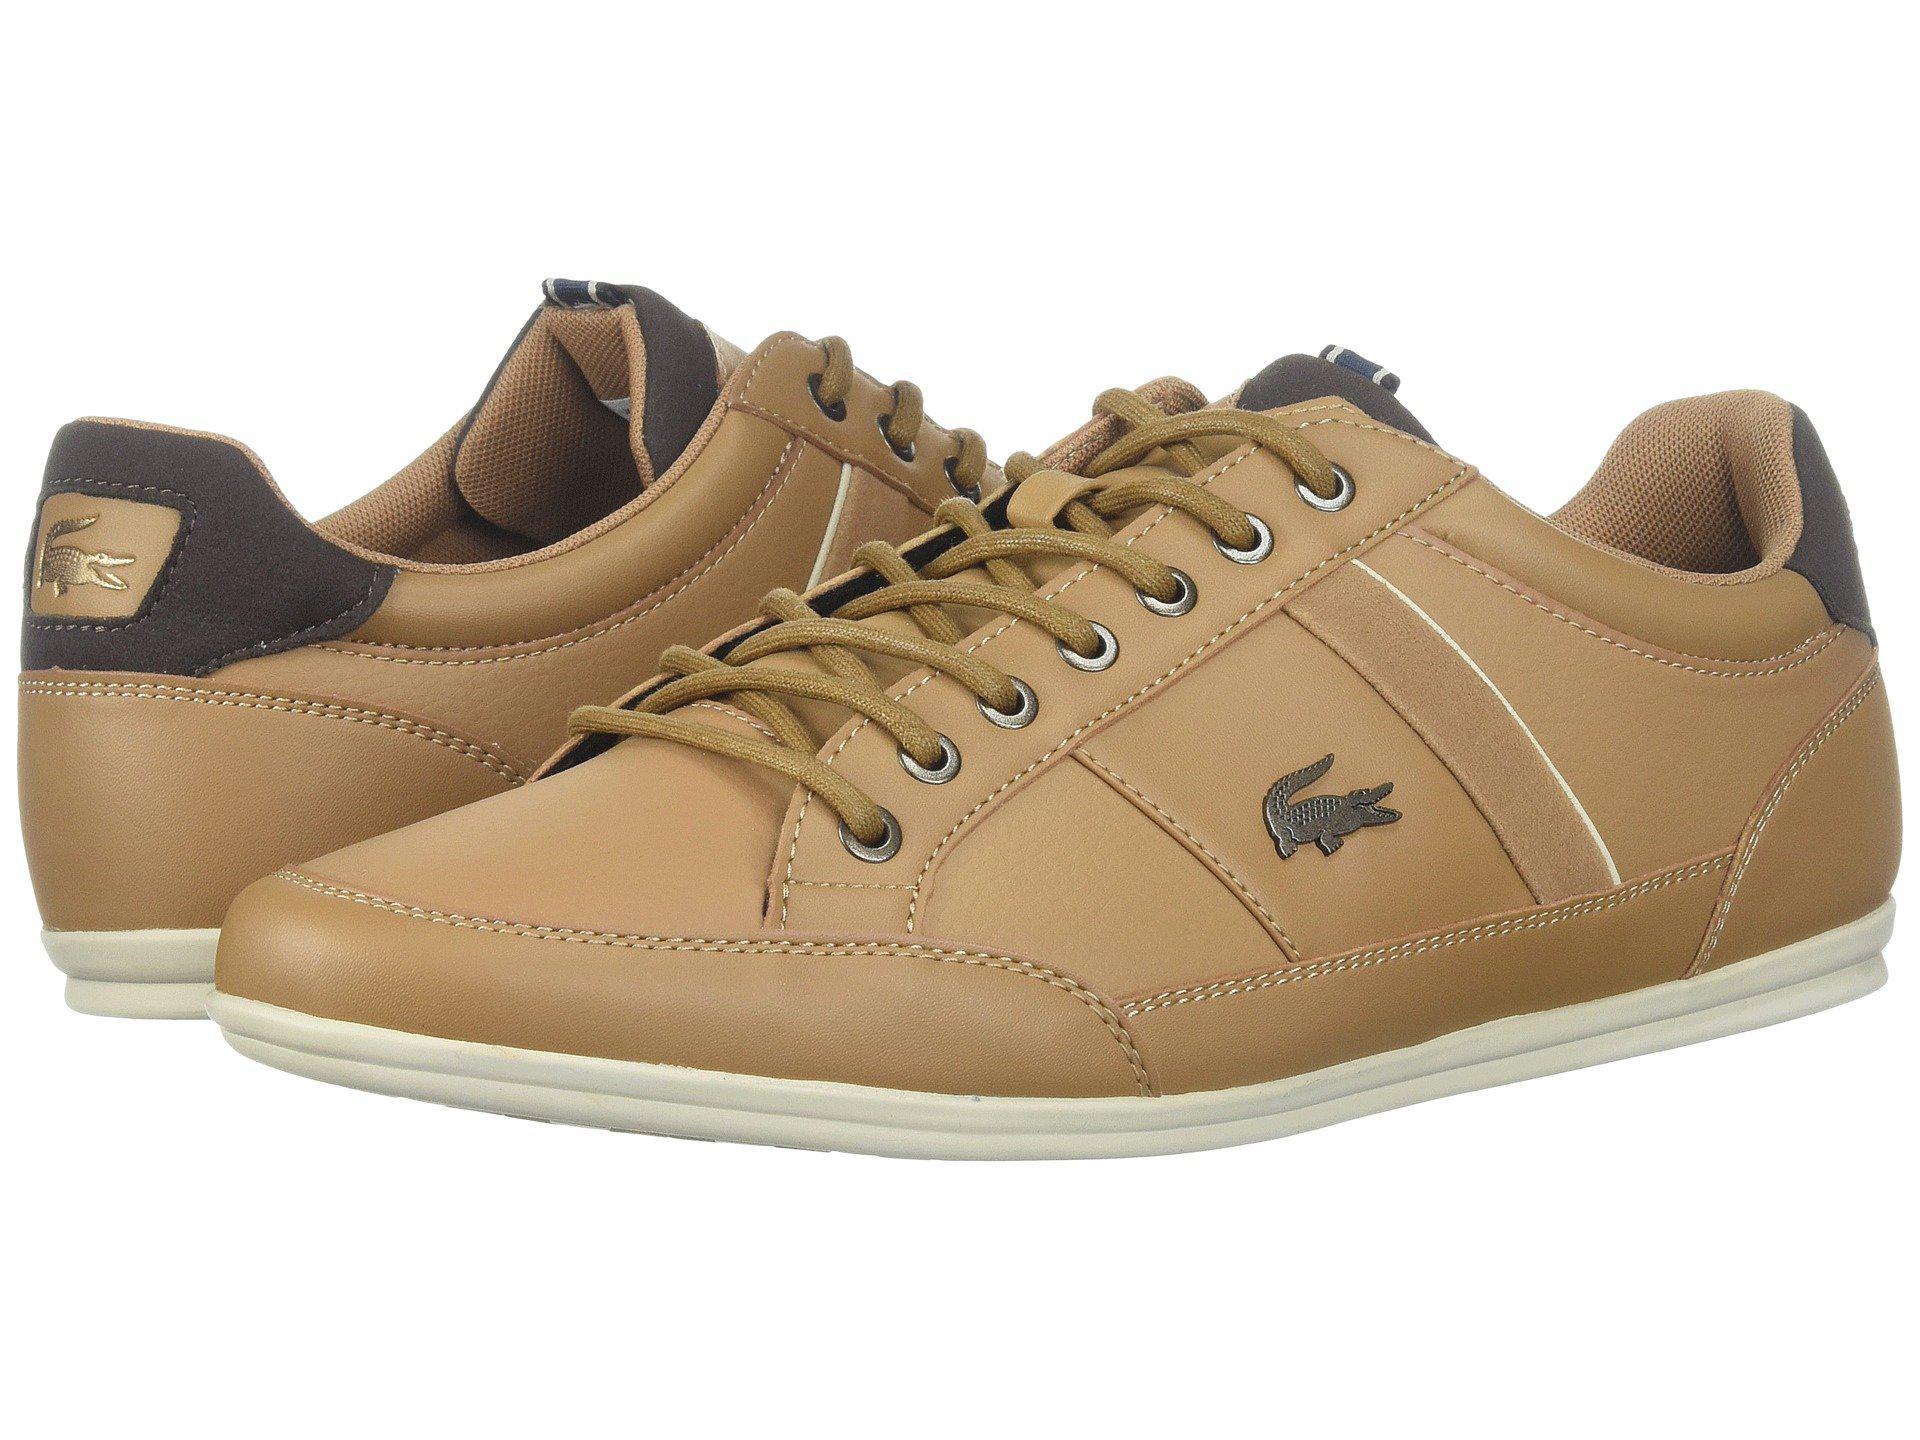 3f56c486dc26 Lyst - Lacoste Chaymon 118 2 (light Brown dark Brown) Men s Shoes in ...